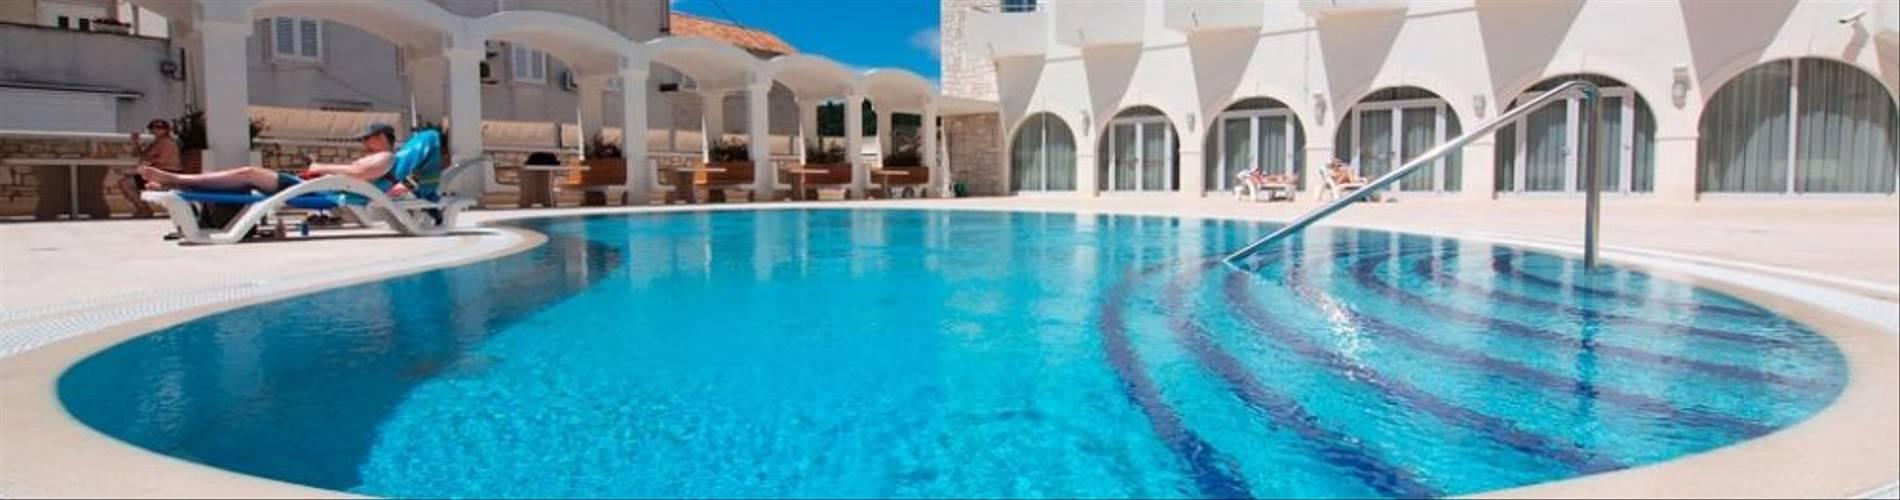 Korkyra-Hotel-Pool.jpg